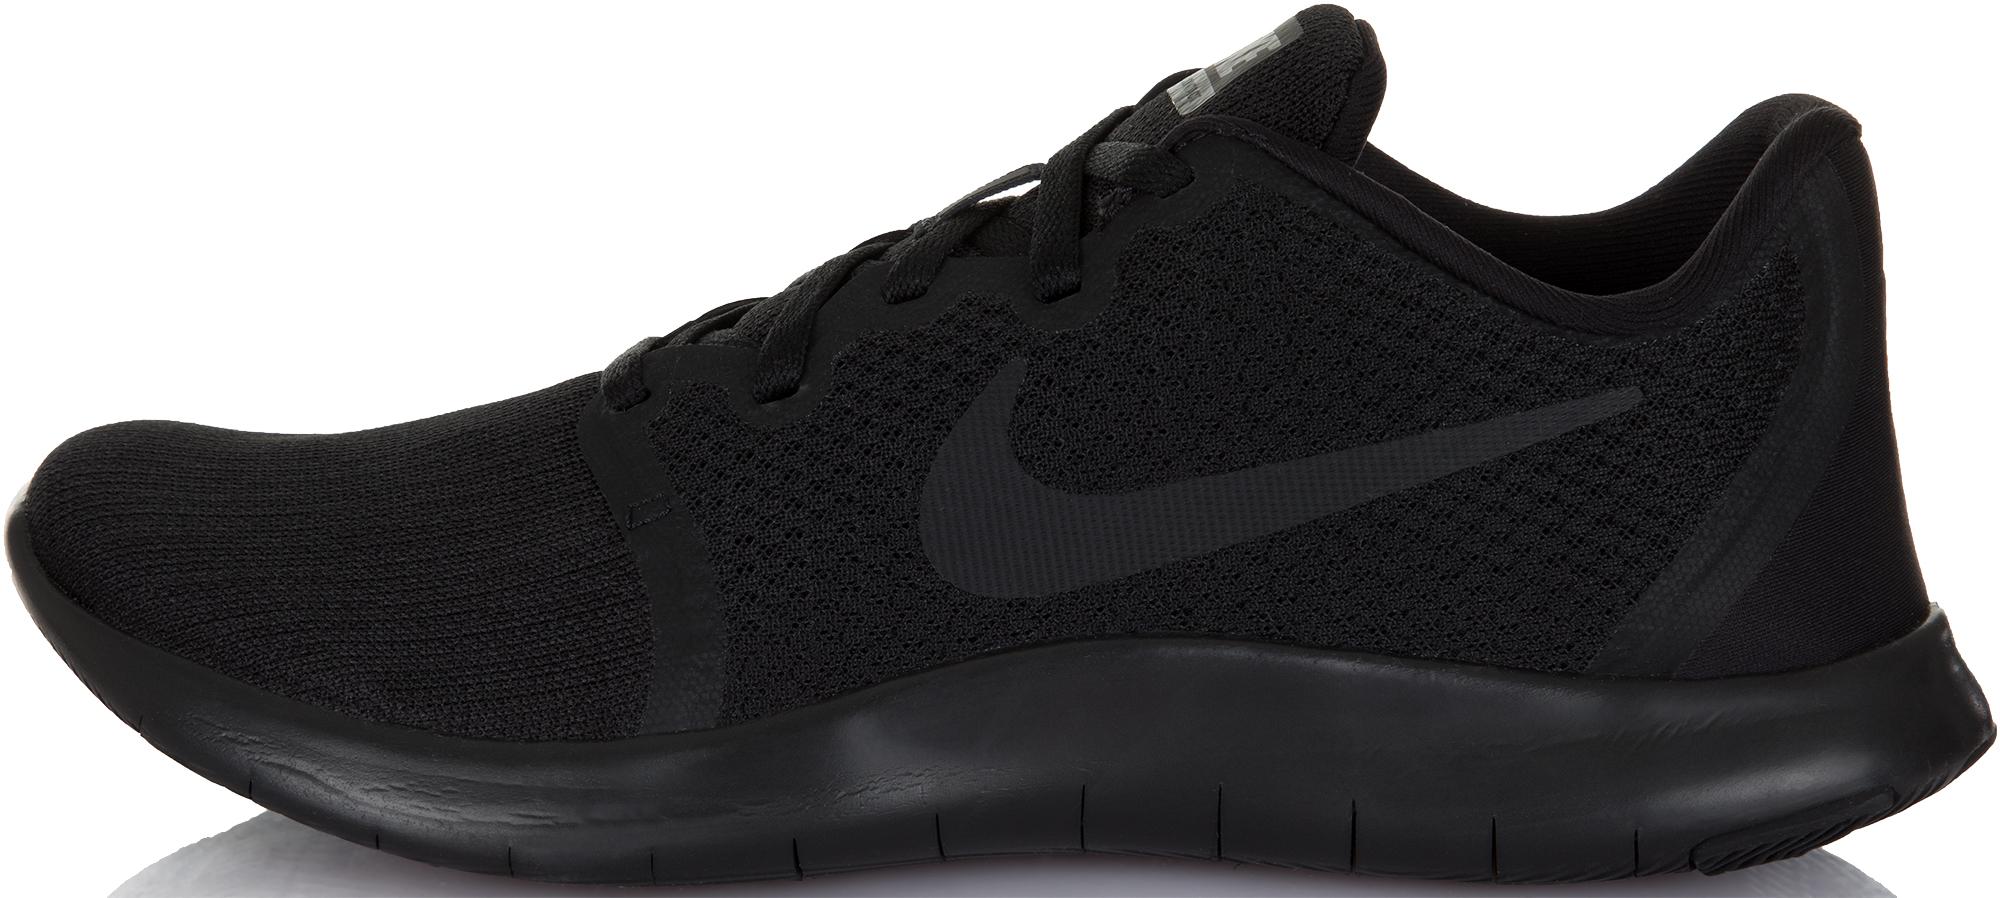 Nike Кроссовки женские Nike Flex Contact 2, размер 38